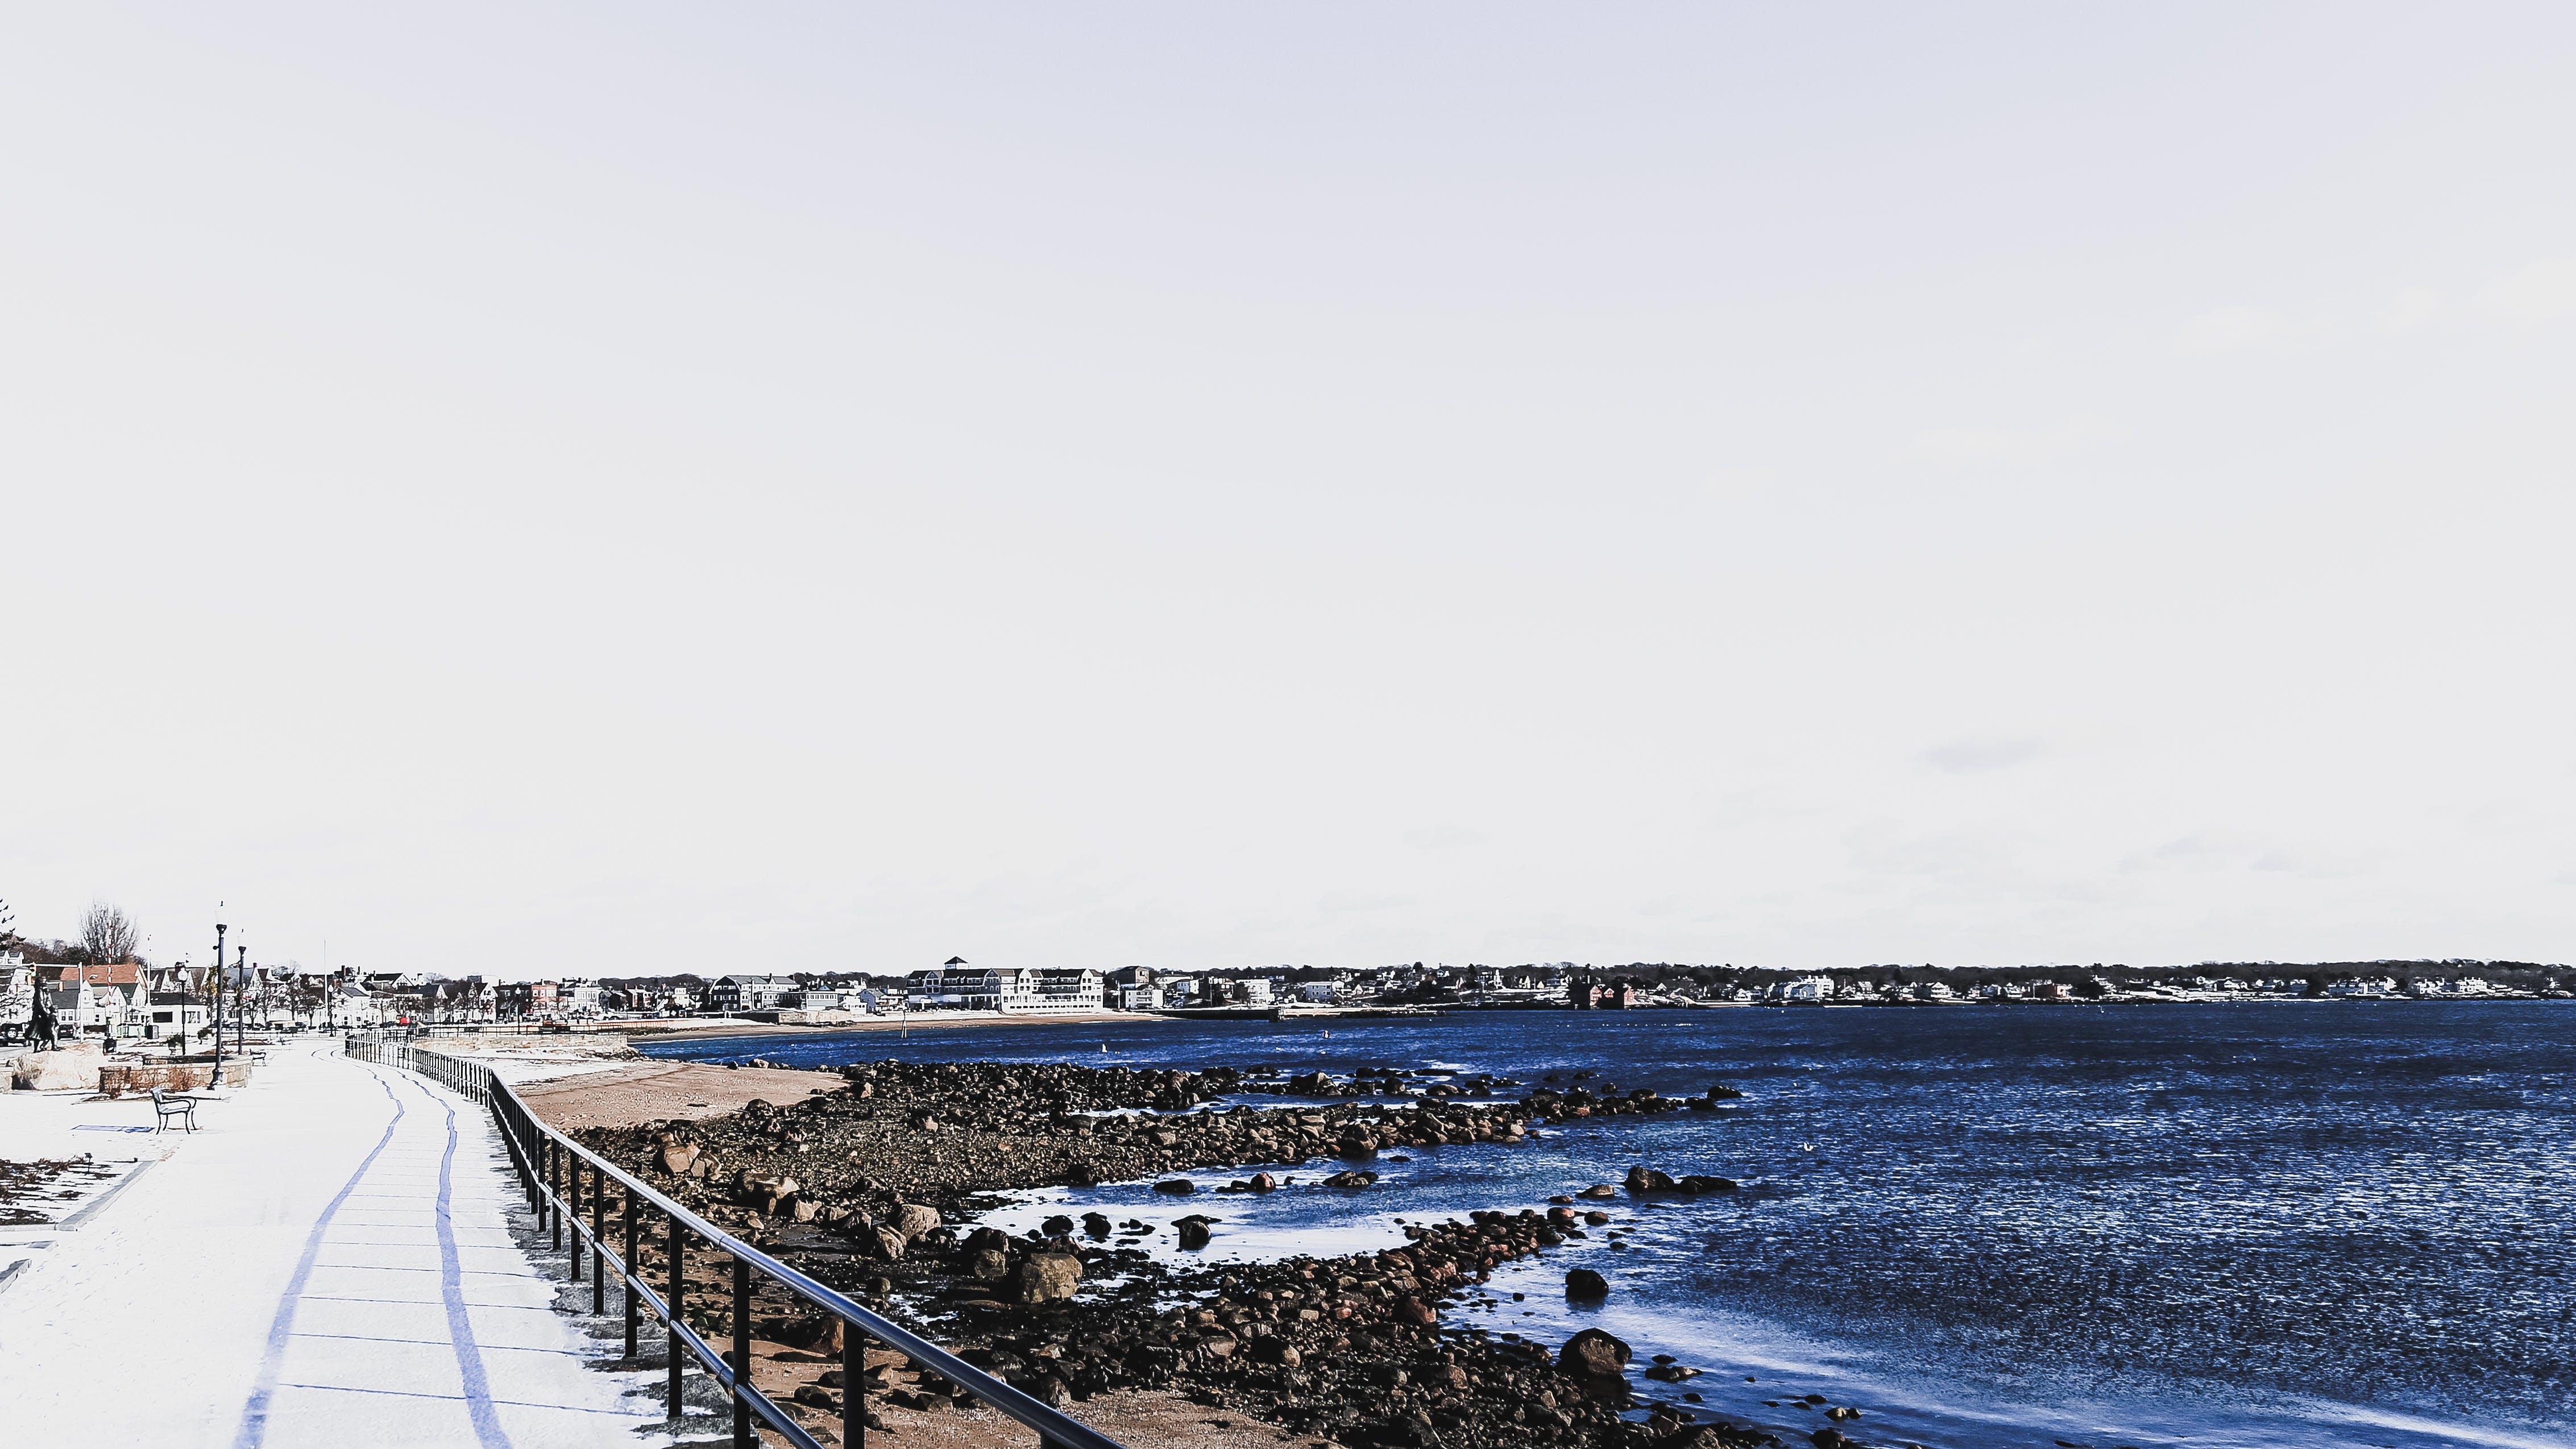 Aerial View of City Near Seashore